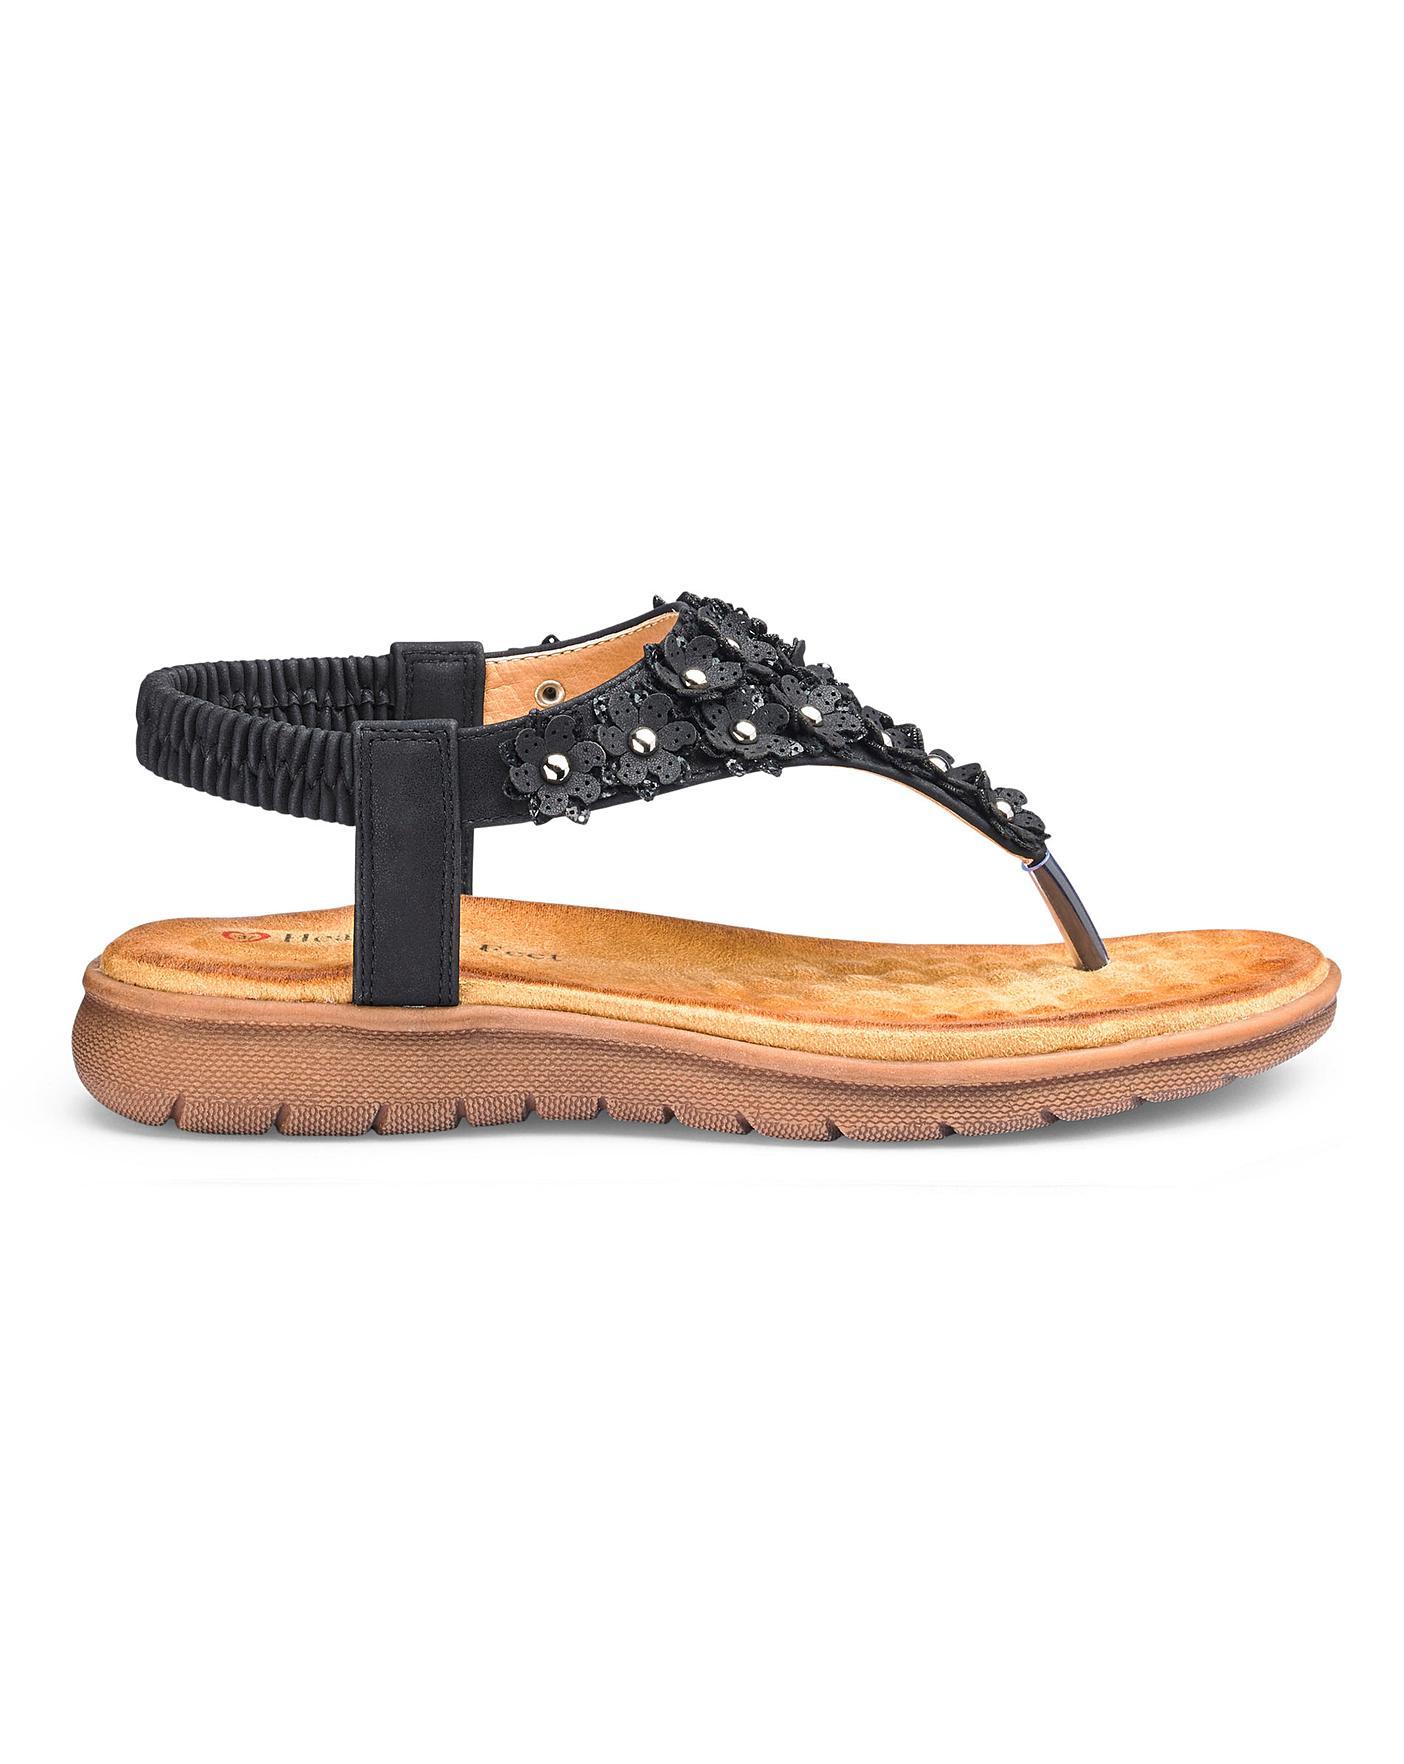 Heavenly Feet Toe Post Sandals E Fit